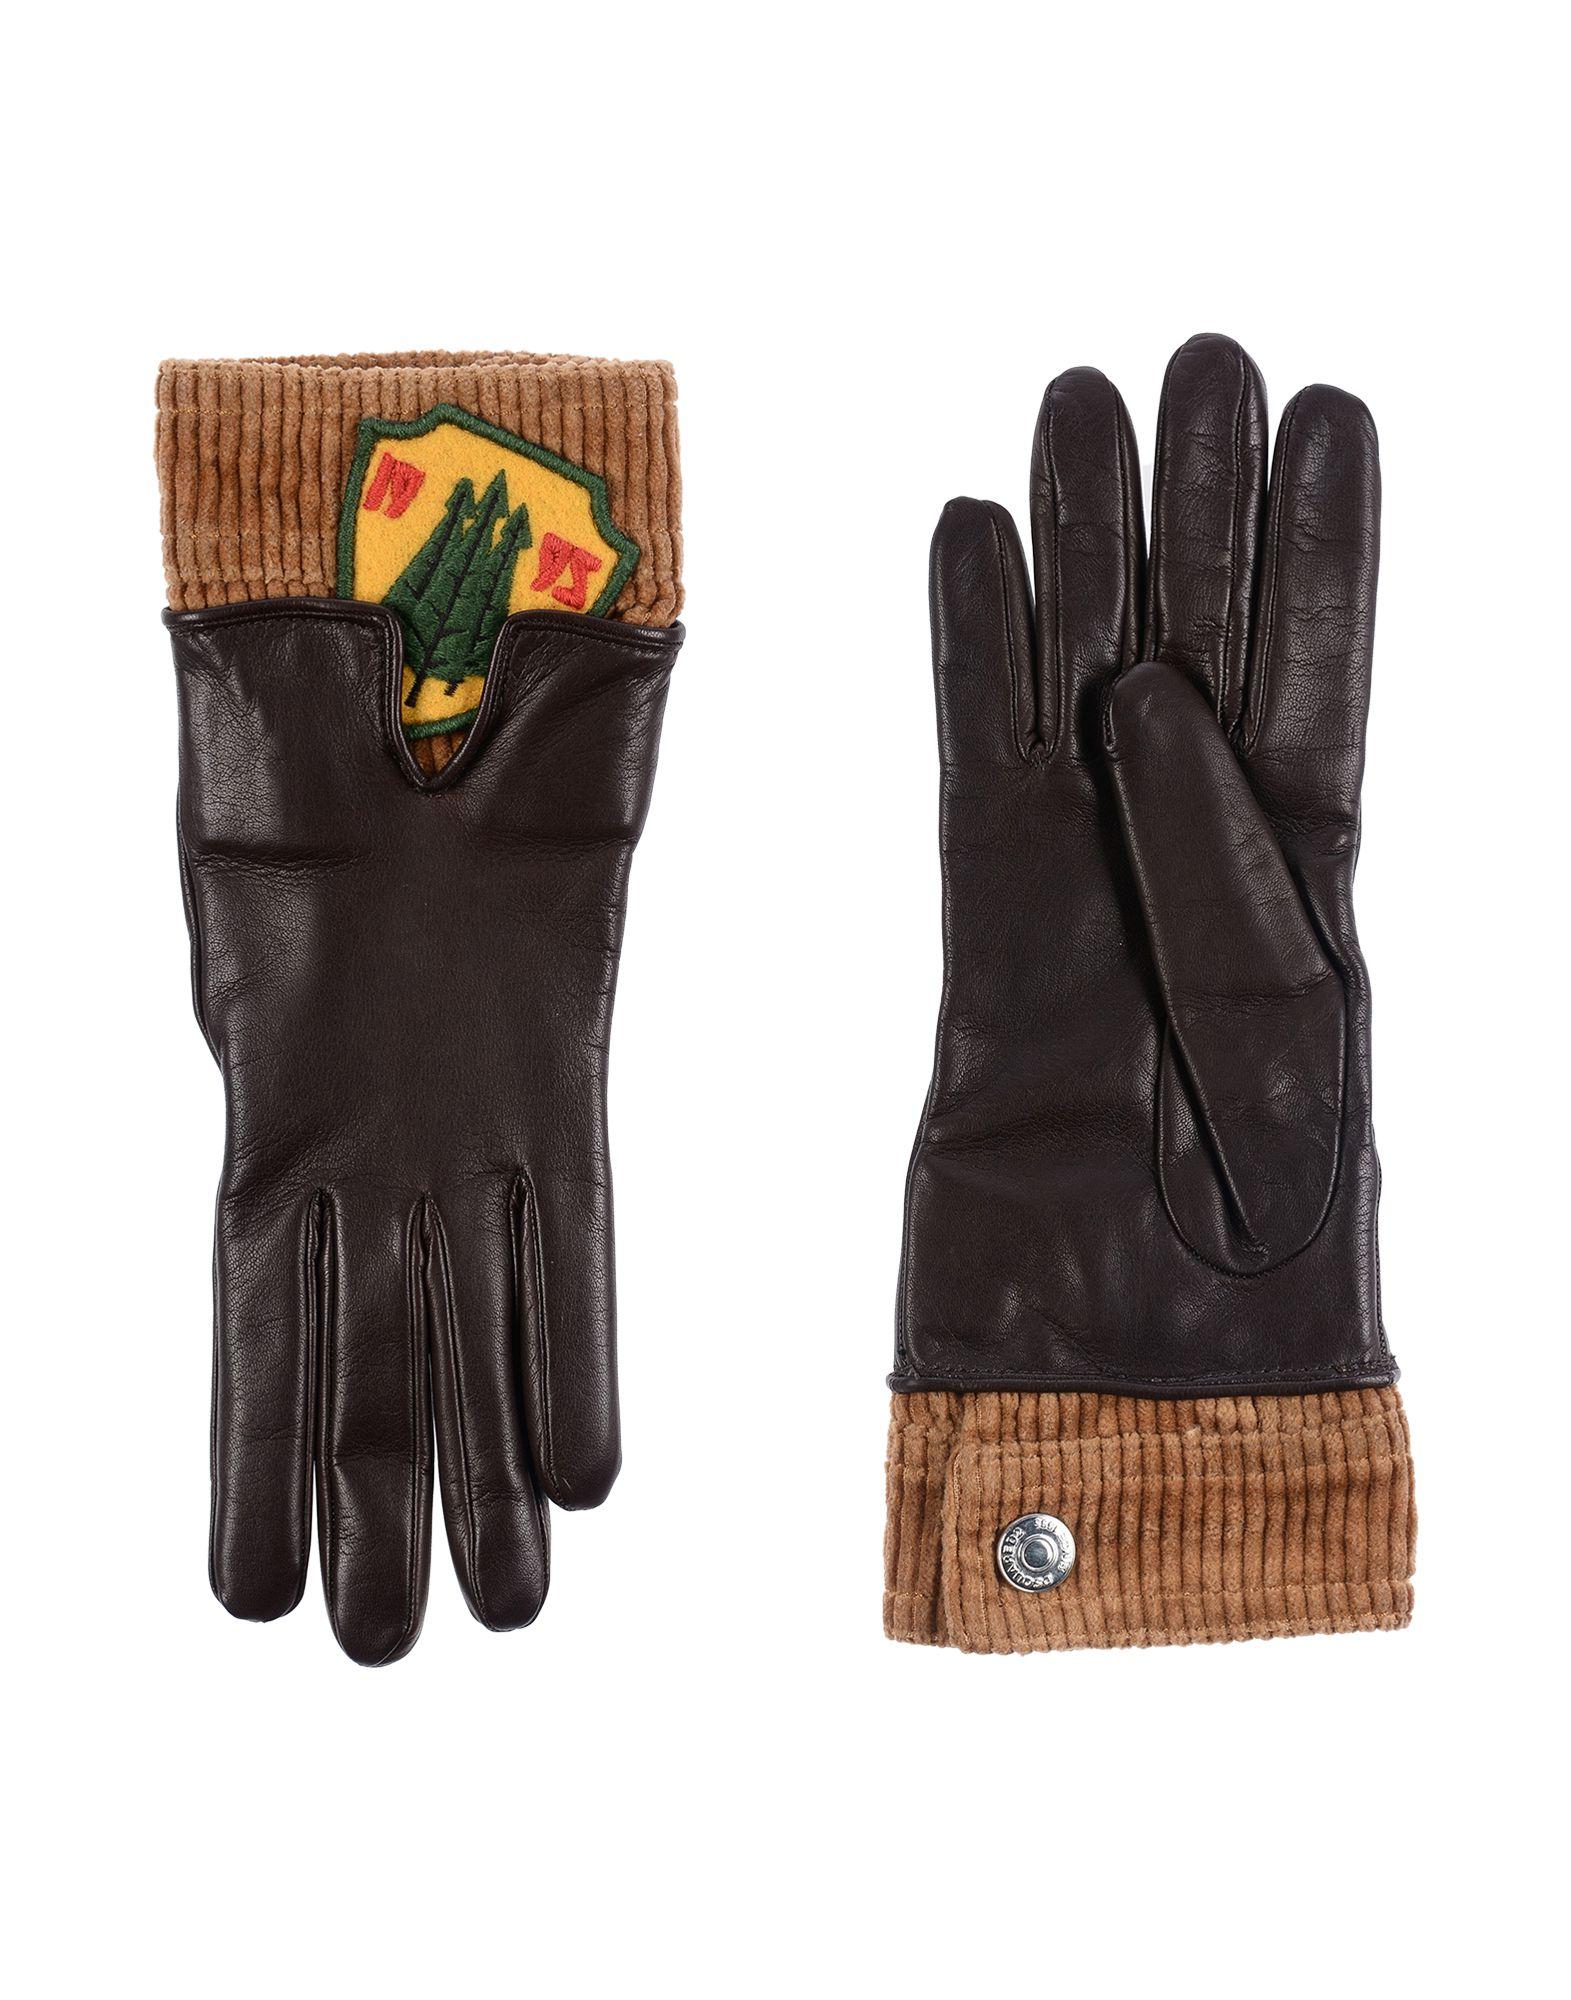 DSQUARED2 Damen Handschuhe Farbe Dunkelbraun Größe 3